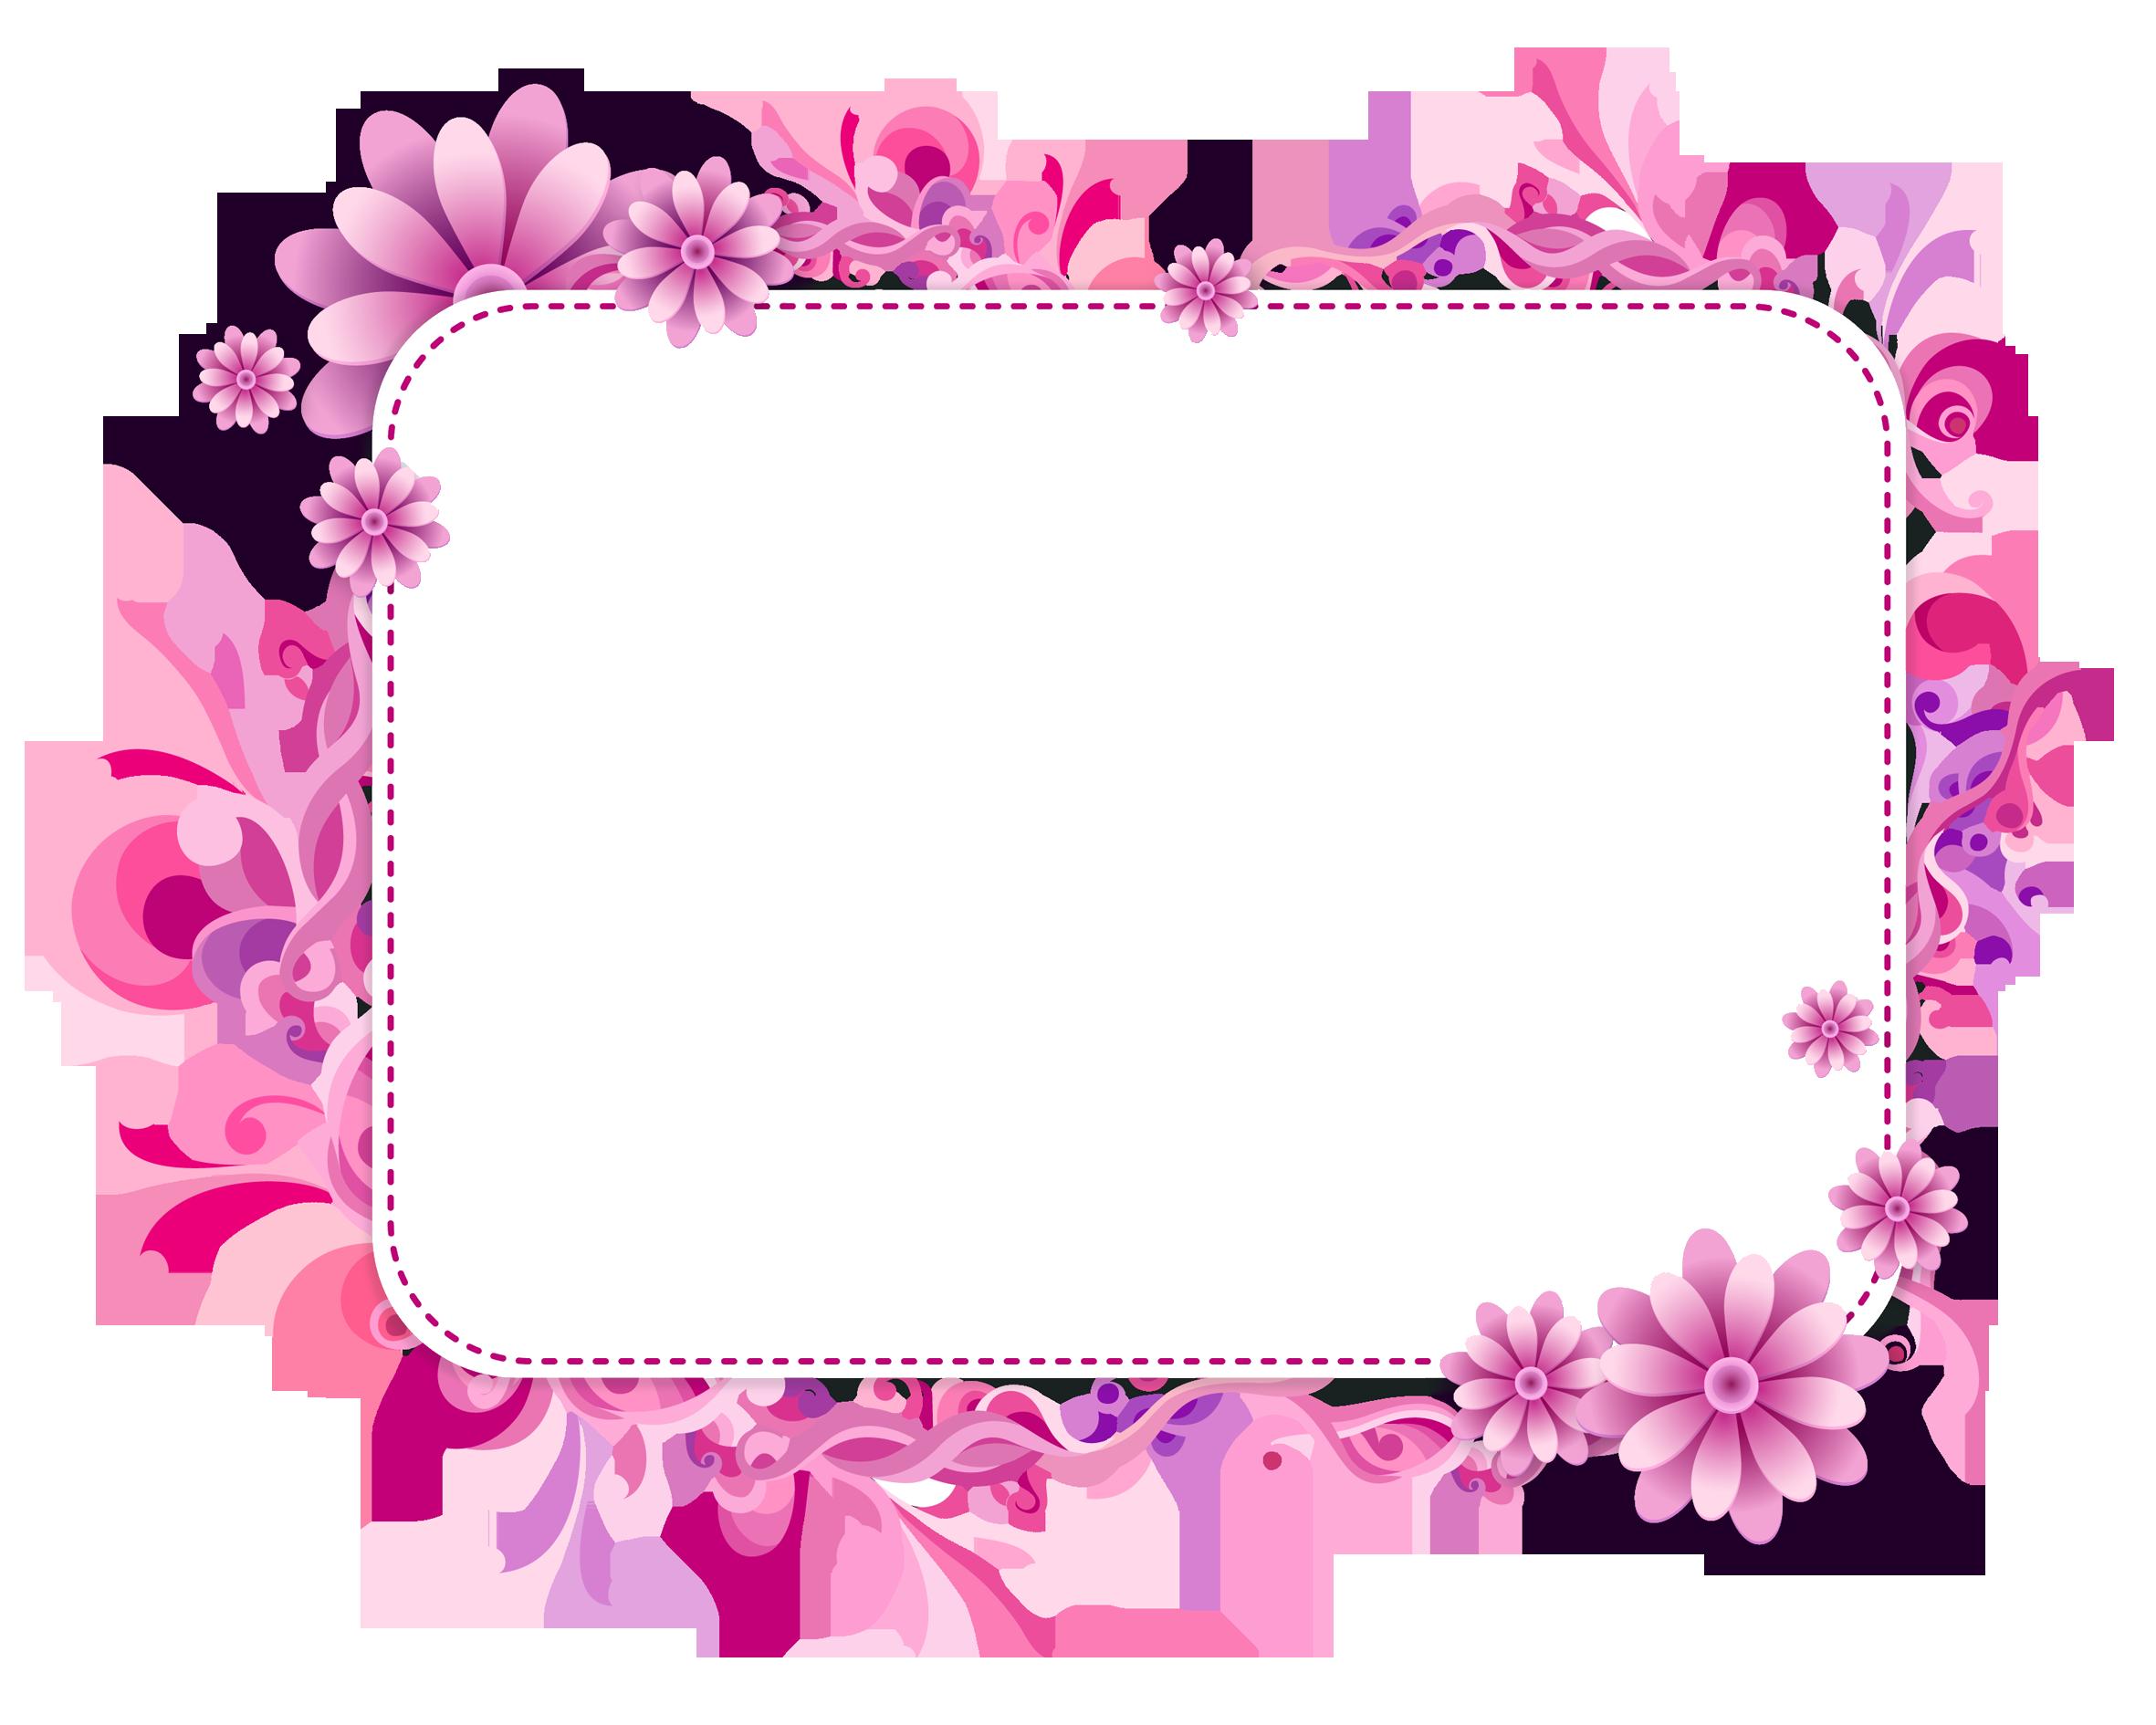 Pink and Purple Vector Frame Frame clipart, Flower frame